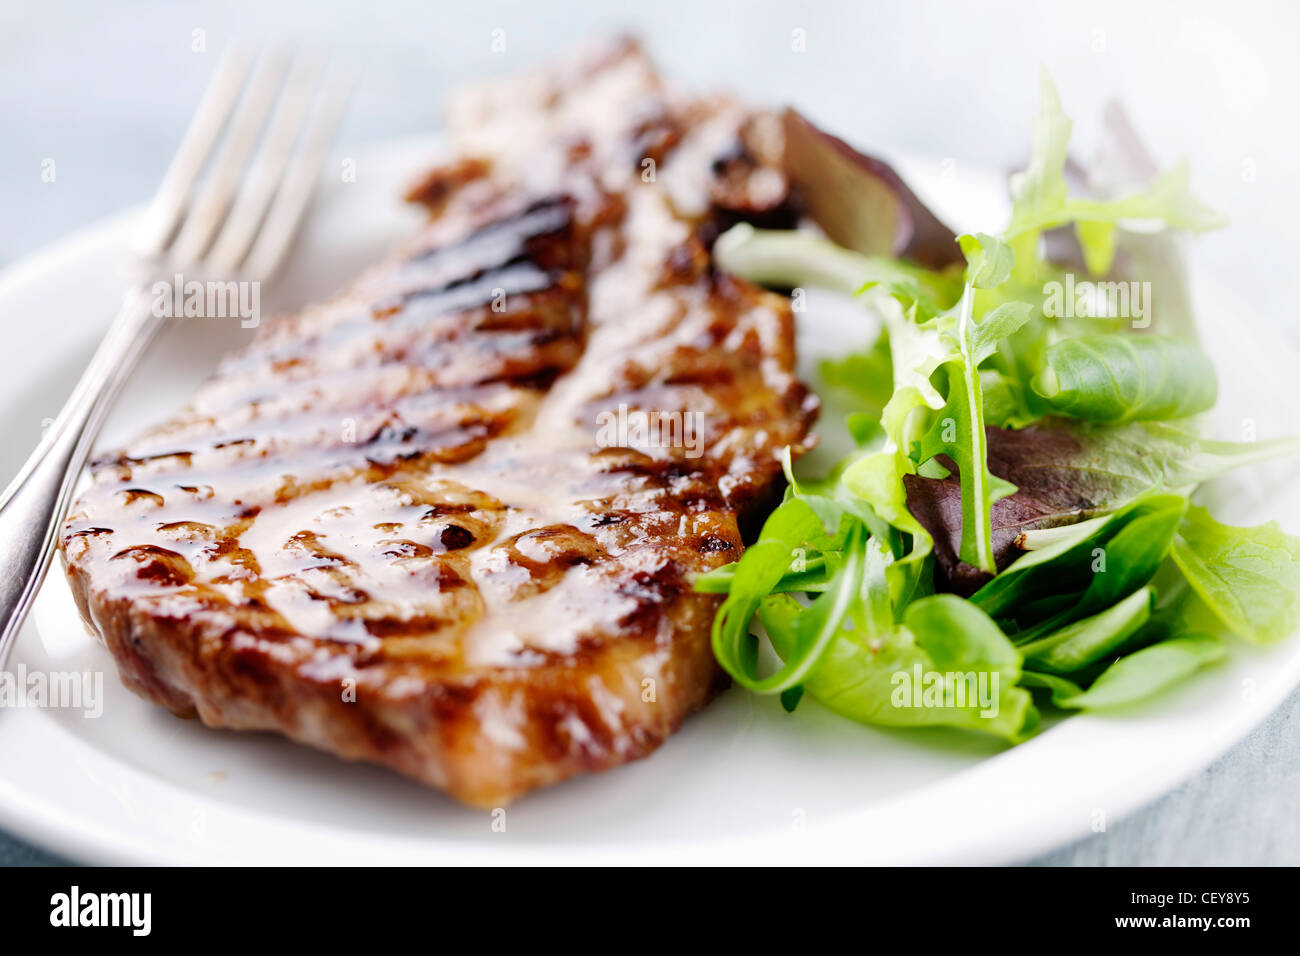 steak and salad - Stock Image